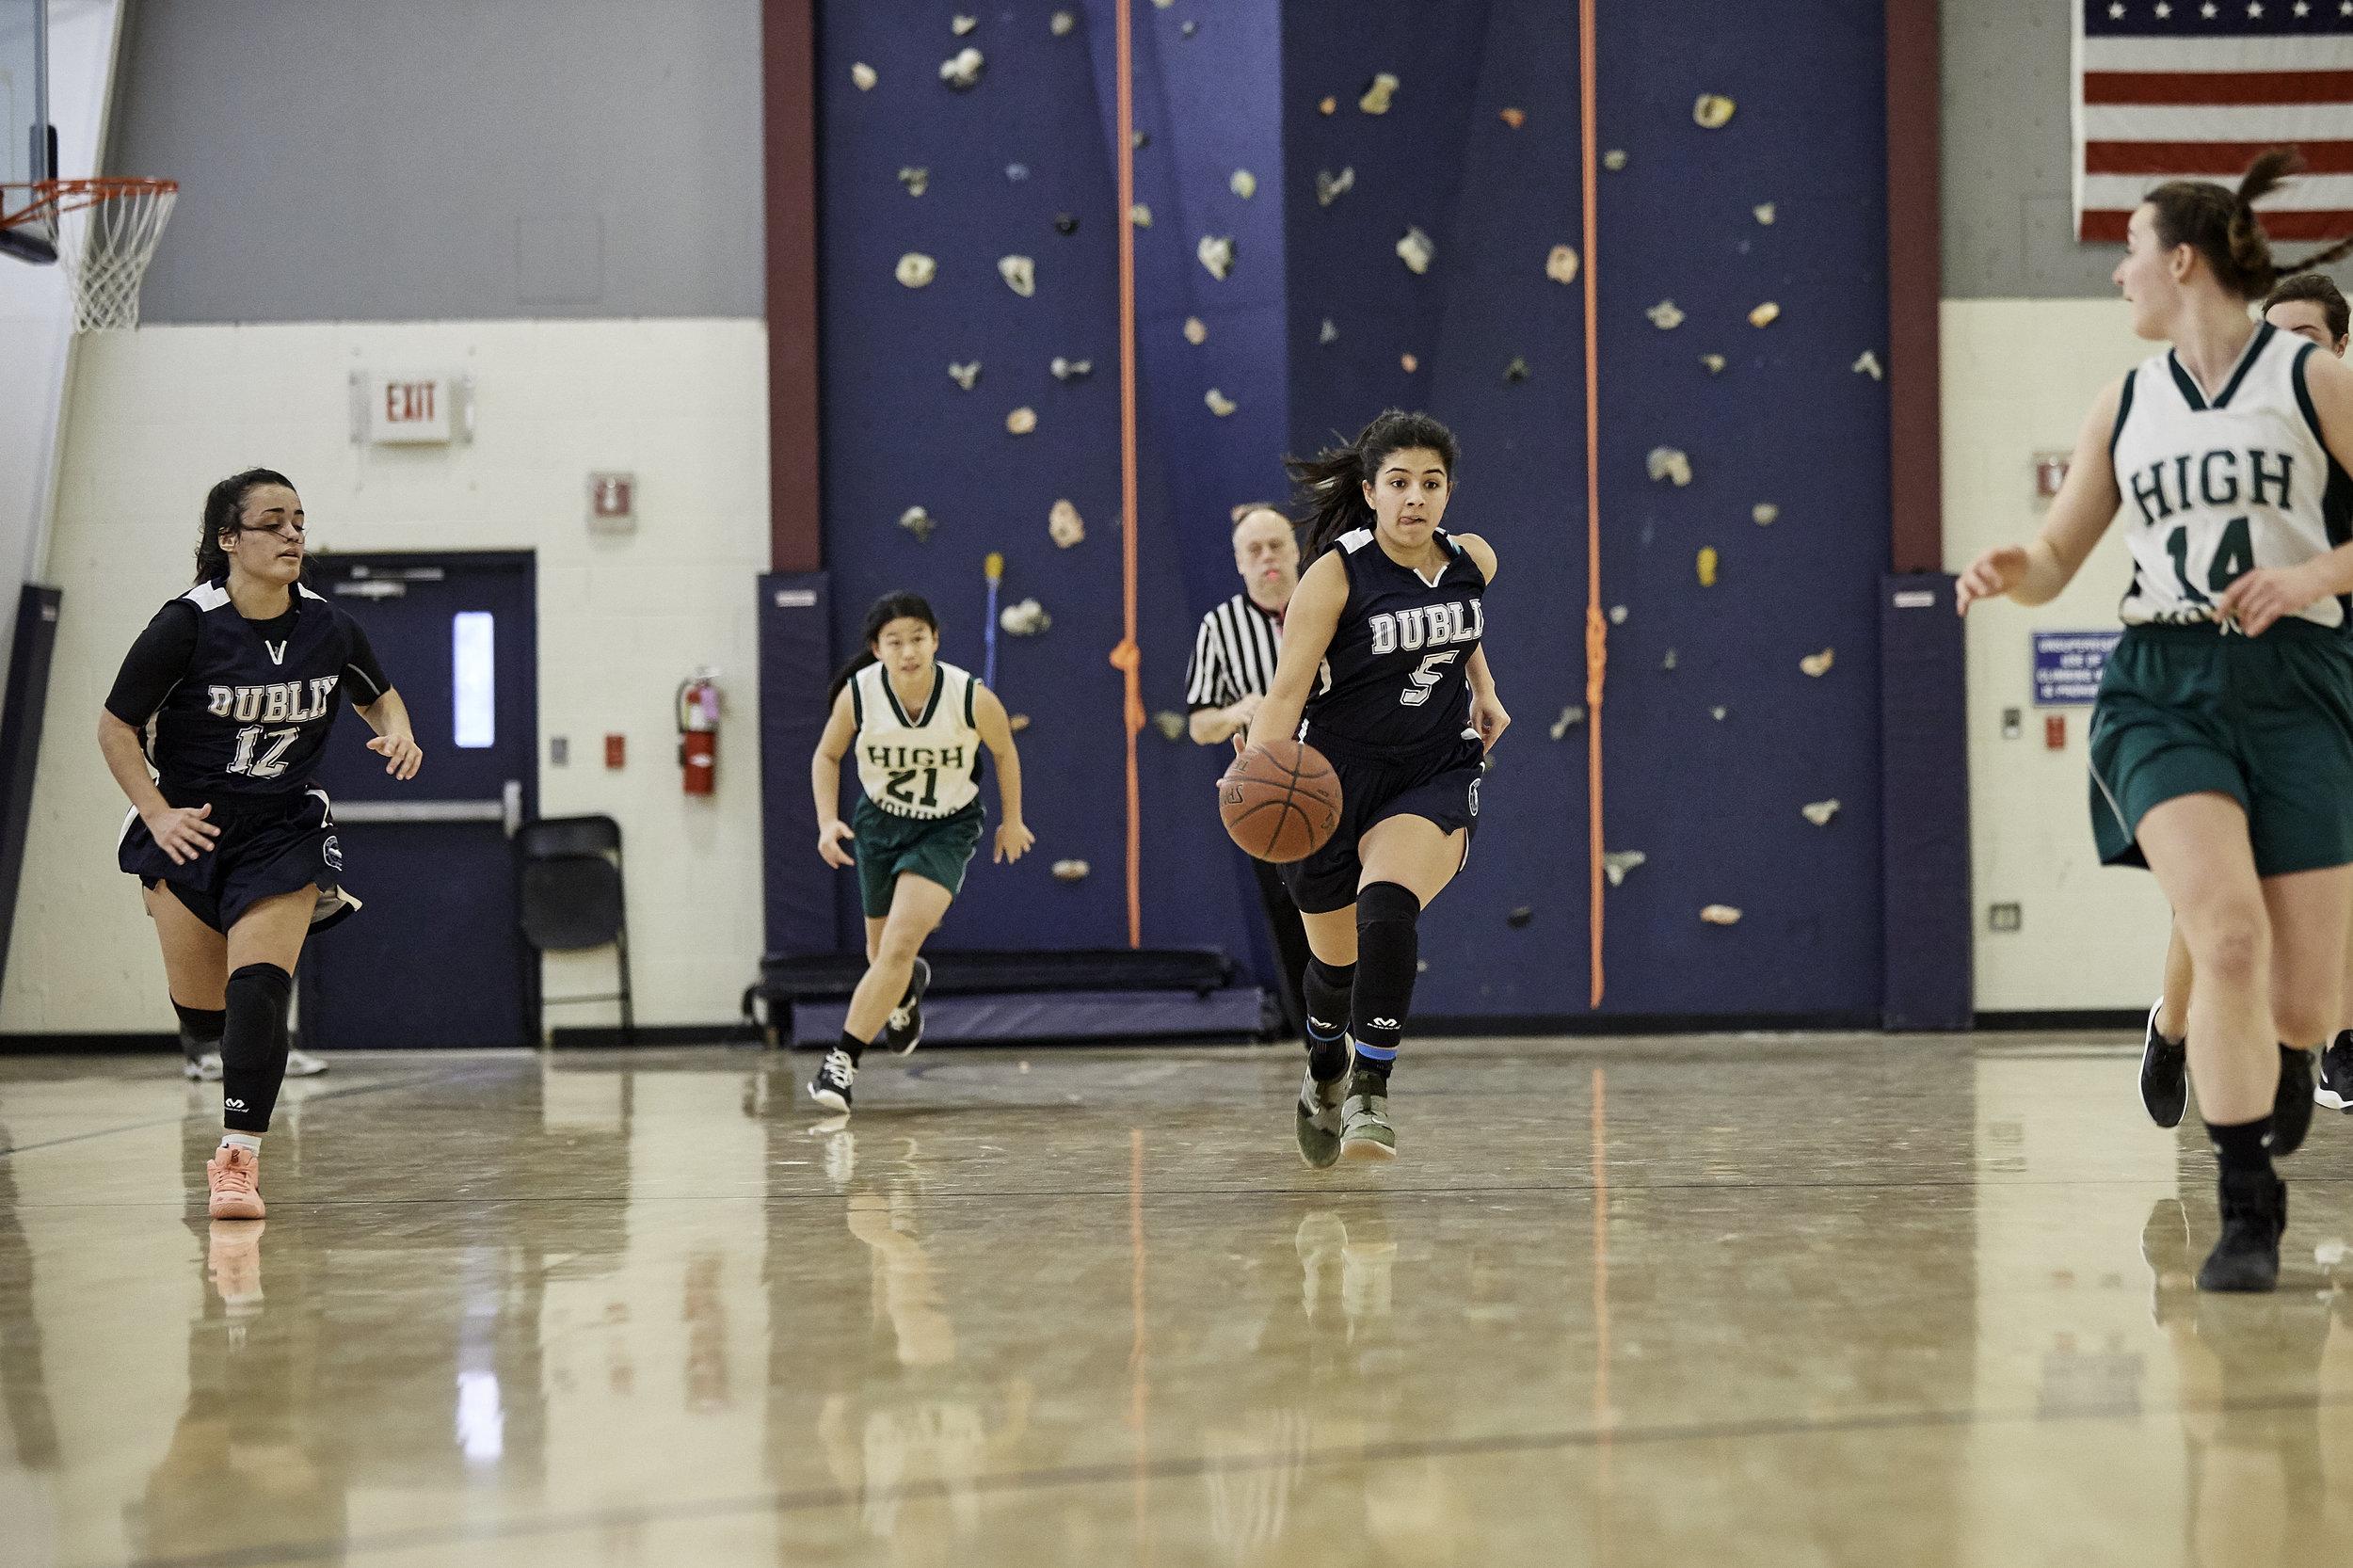 Basketball vs High Mowing School, February 2, 2019 - 166298.jpg